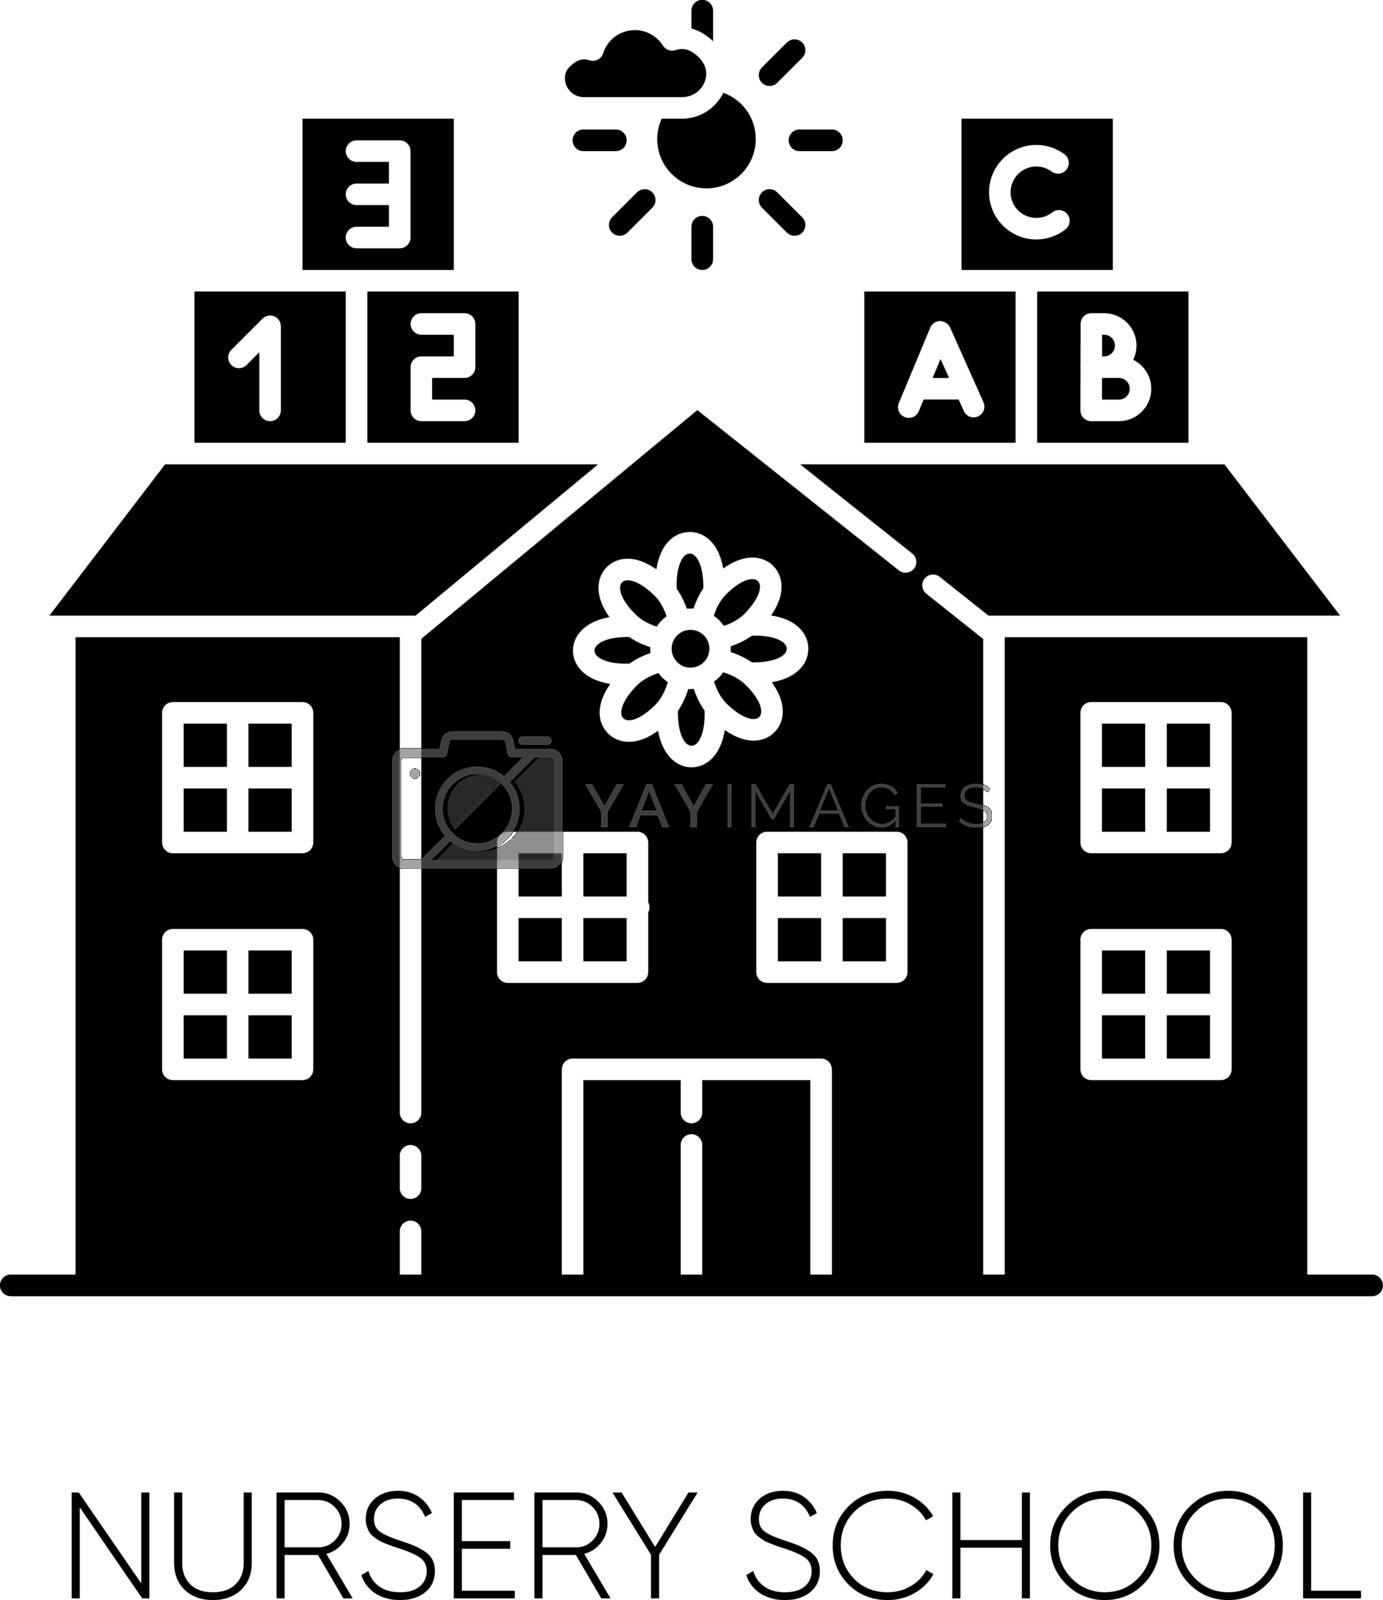 Nursery school black glyph icon. Pre primary, elementary education establishment for little children. Play school, day care, kindergarten silhouette symbol on white space. Vector isolated illustration